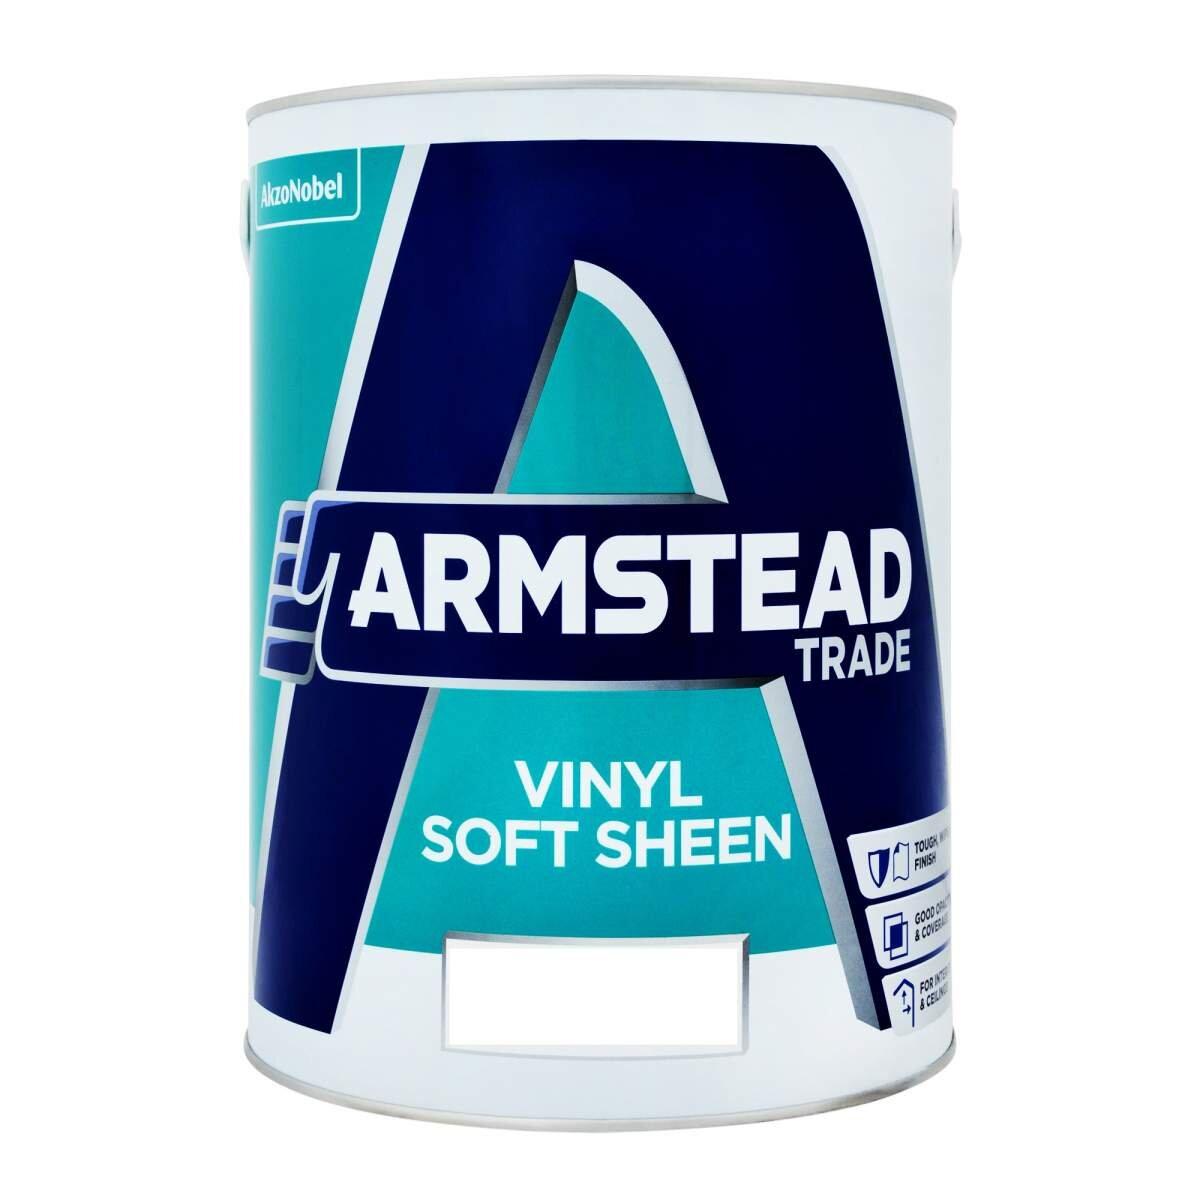 Armstead Trade Vinyl Soft Sheen Magnolia Ready Mixed 5l